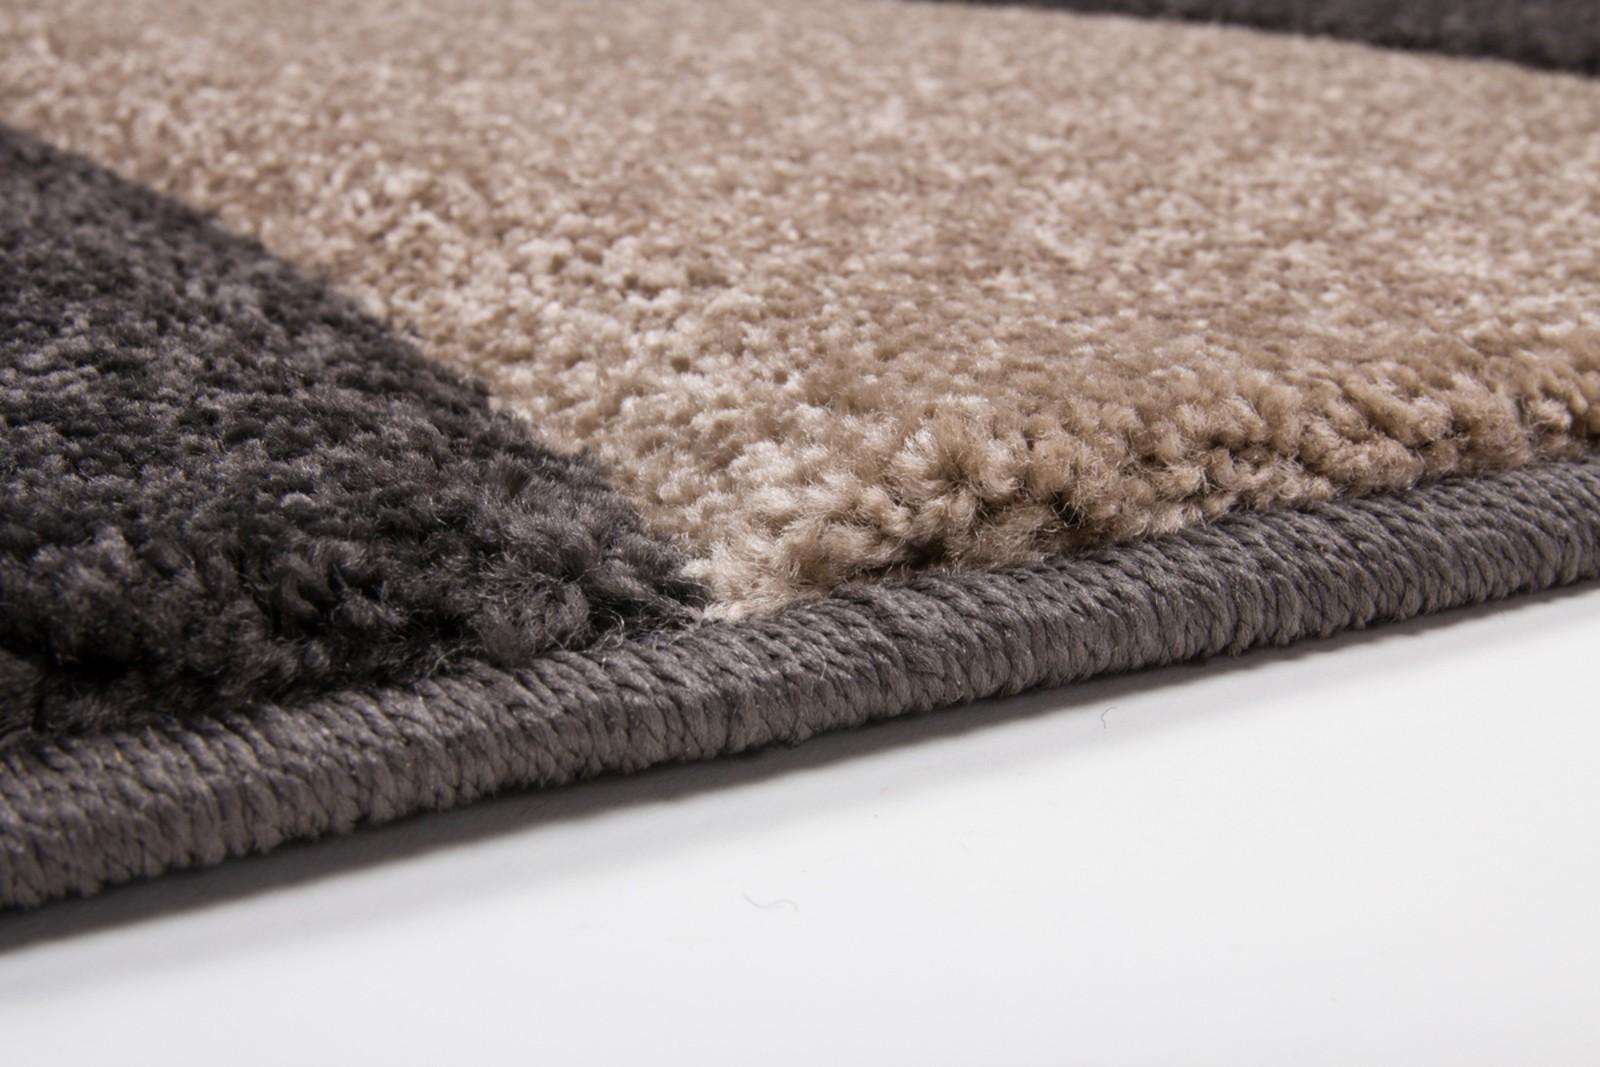 tapis salon marron top tapis design et modernes pas cher grands tapis salon marron beige ecru. Black Bedroom Furniture Sets. Home Design Ideas